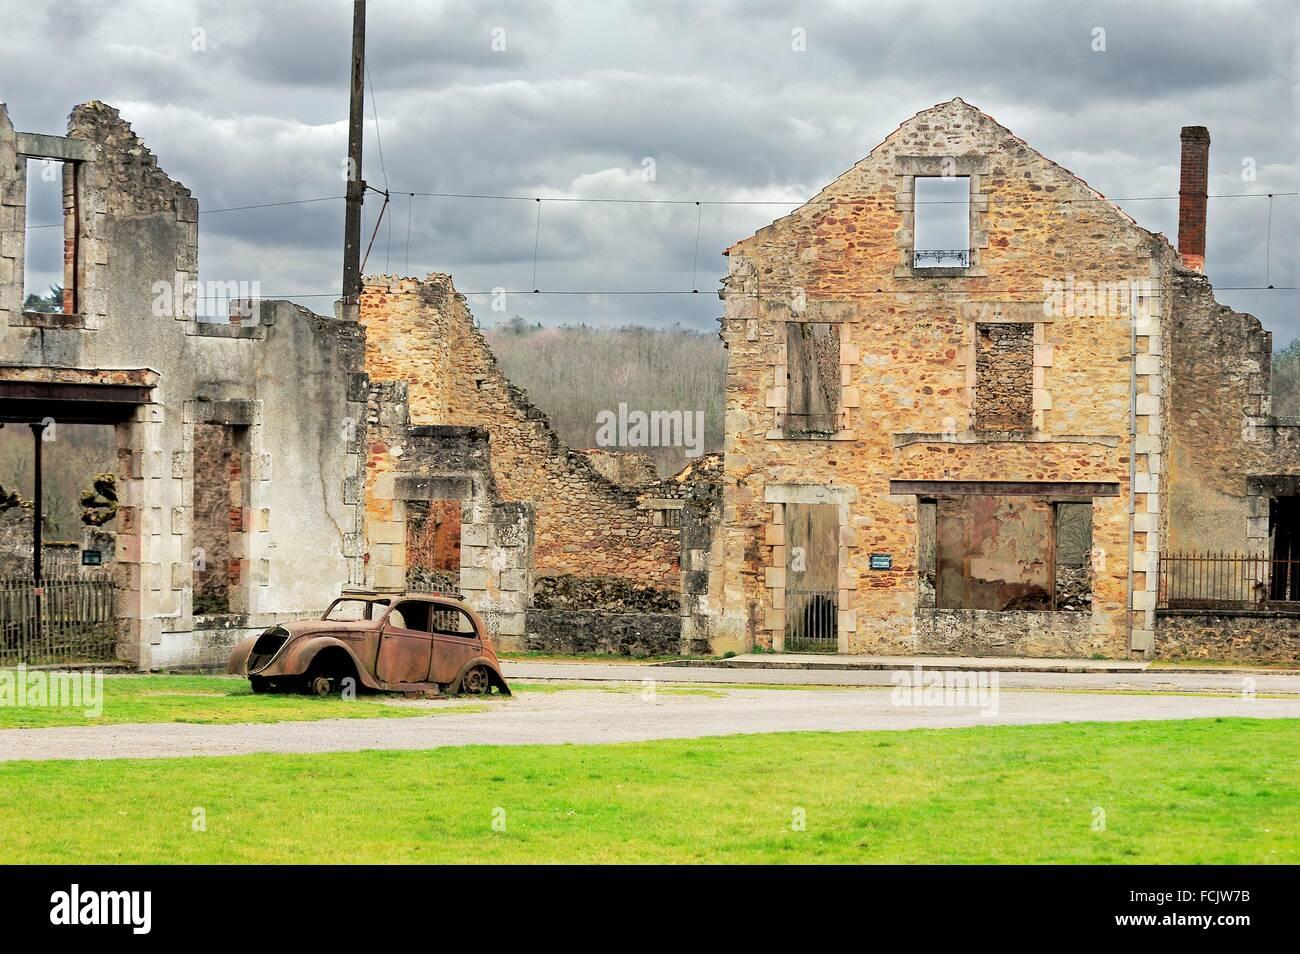 building ruins and remains of Peugeot 202 car, Oradour-sur-Glane, Haute-Vienne Department, Limousin, France. - Stock Image